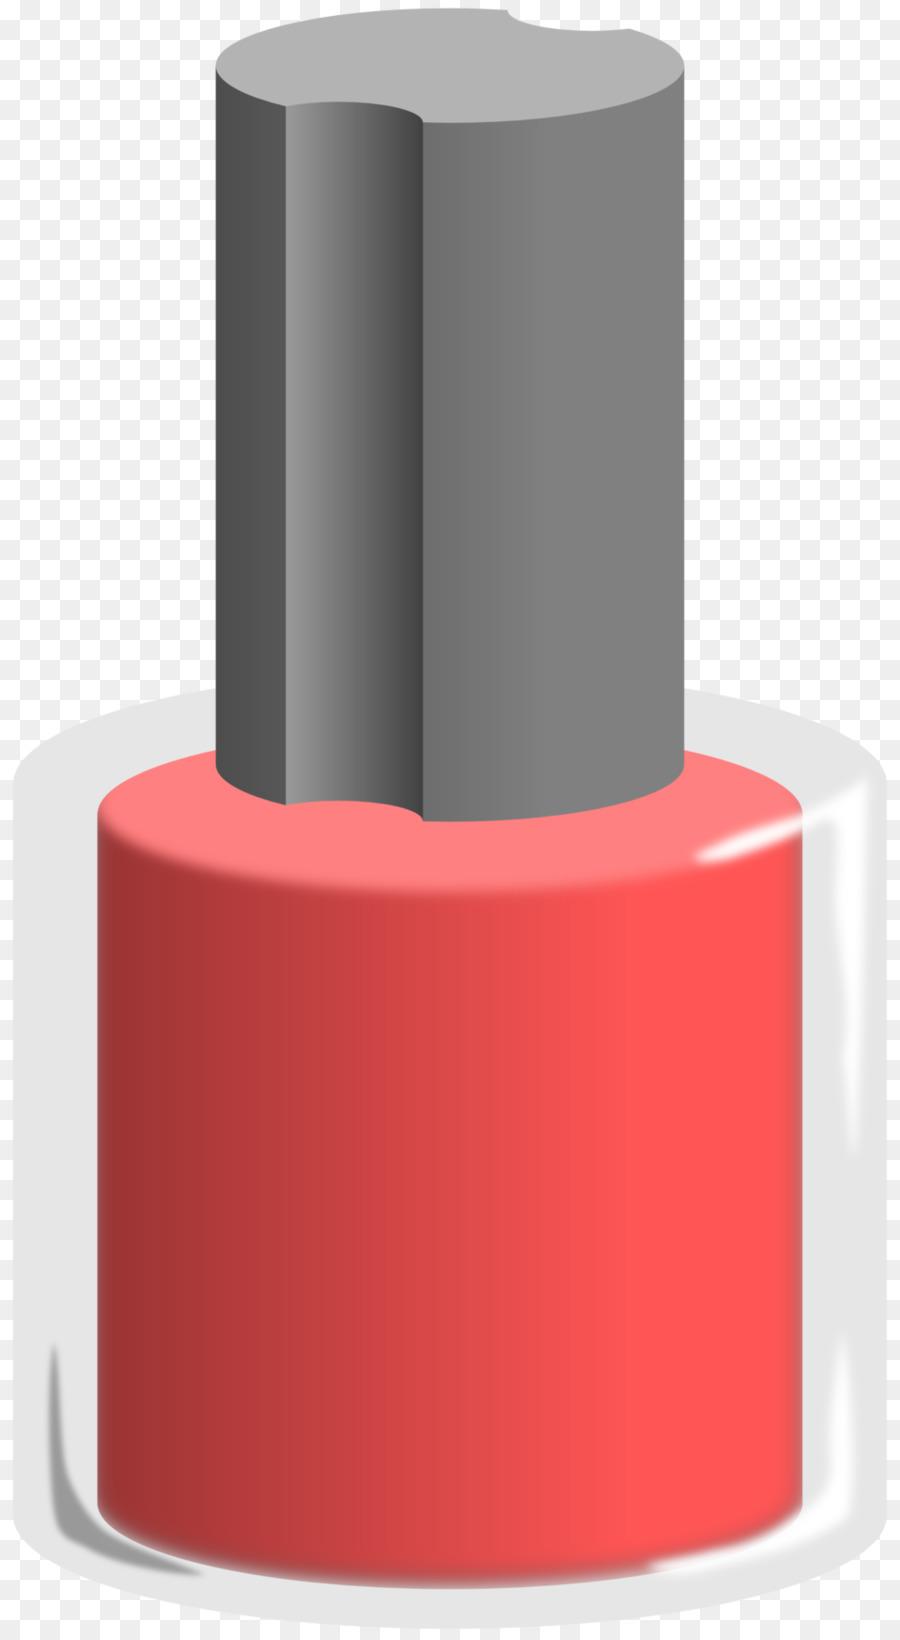 Clip art . Nail clipart nail polish bottle